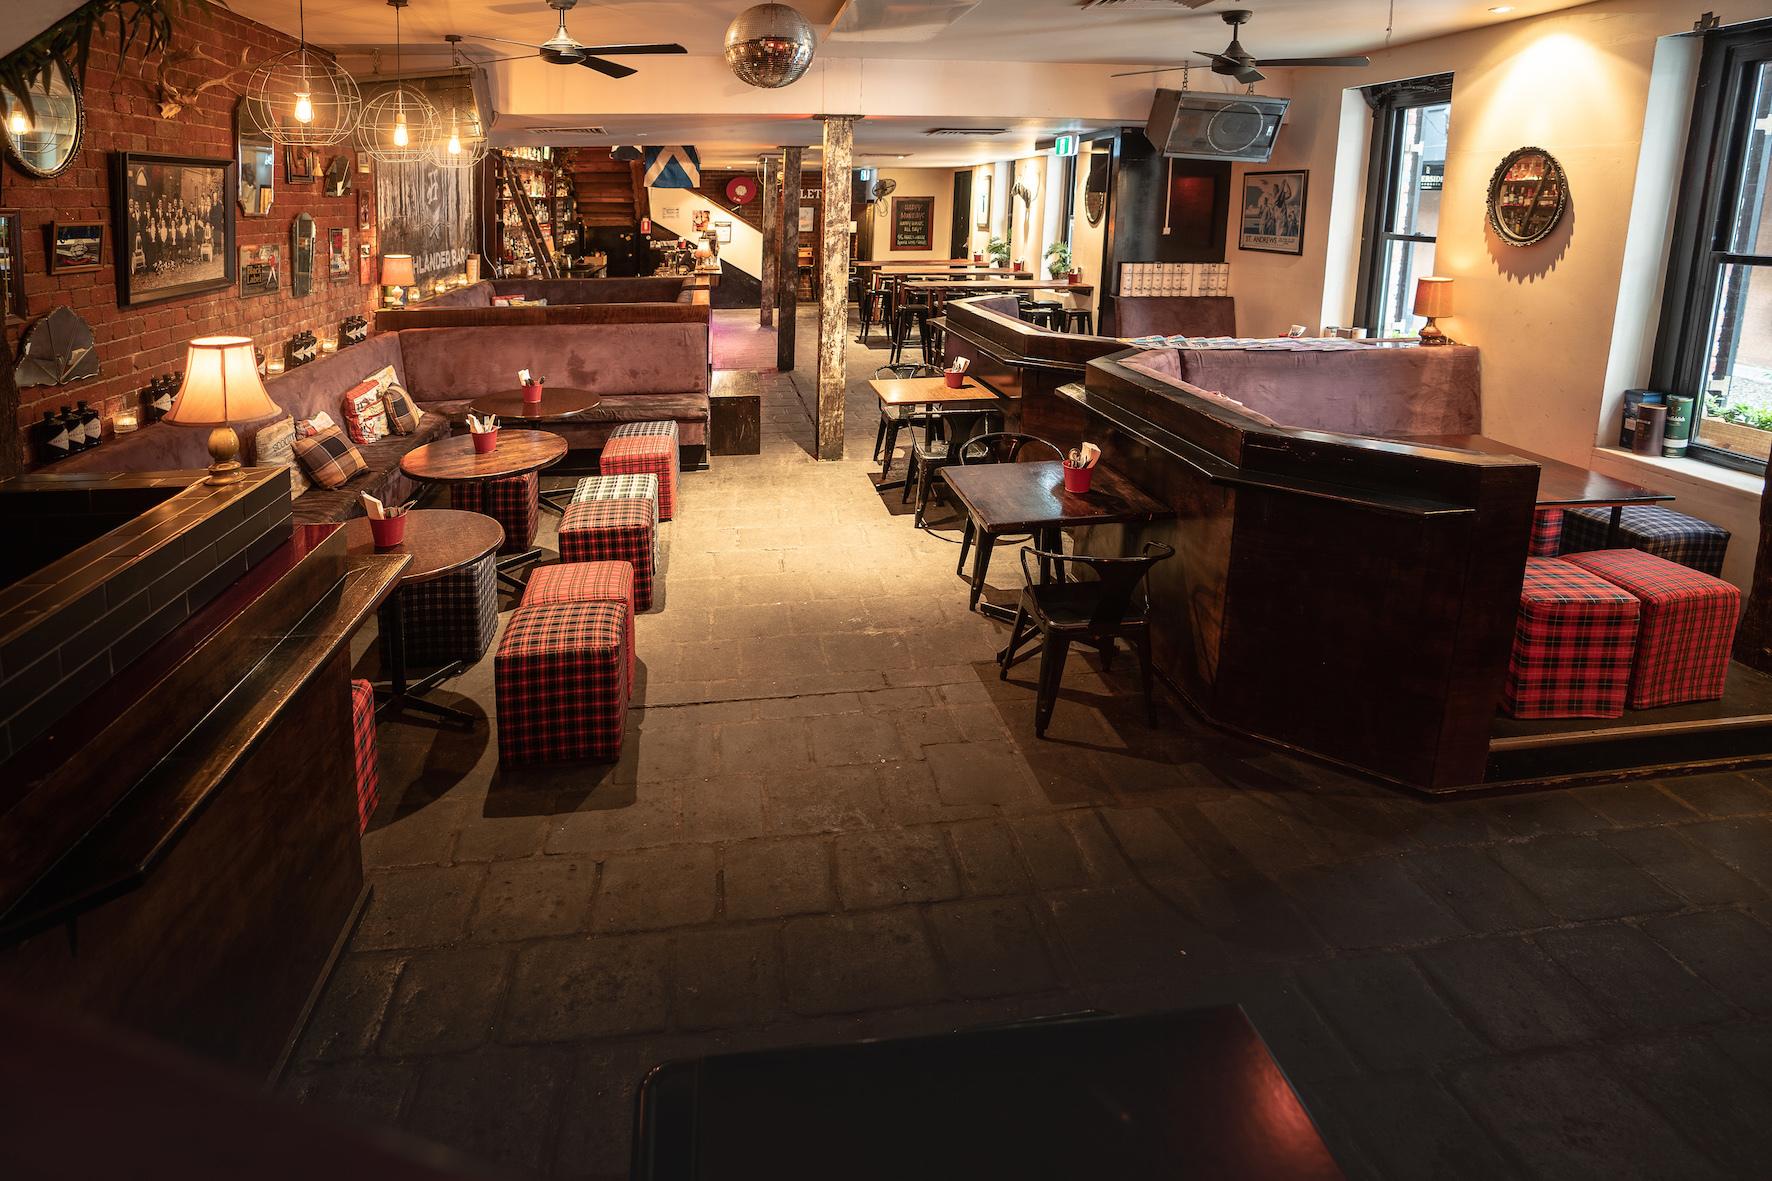 g - Highlander Bar